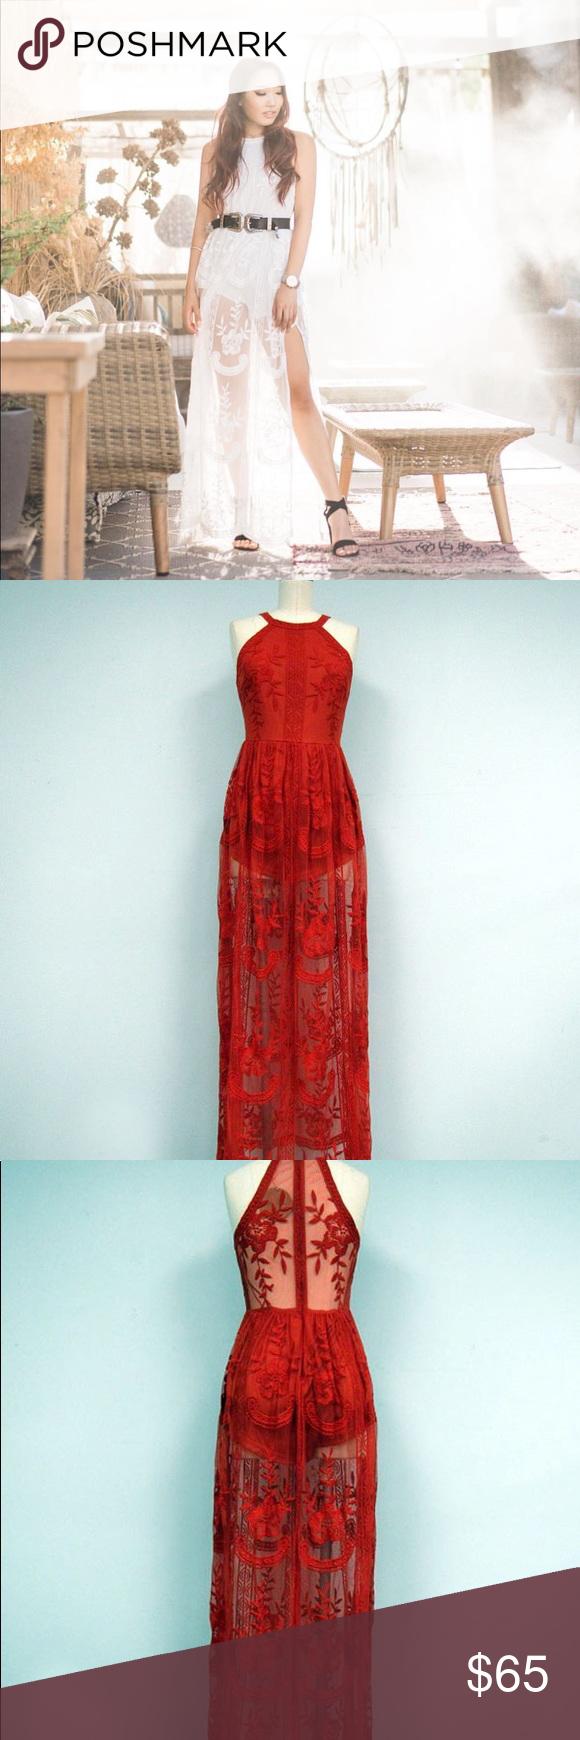 The jetset diaries majestic lace maxi dress